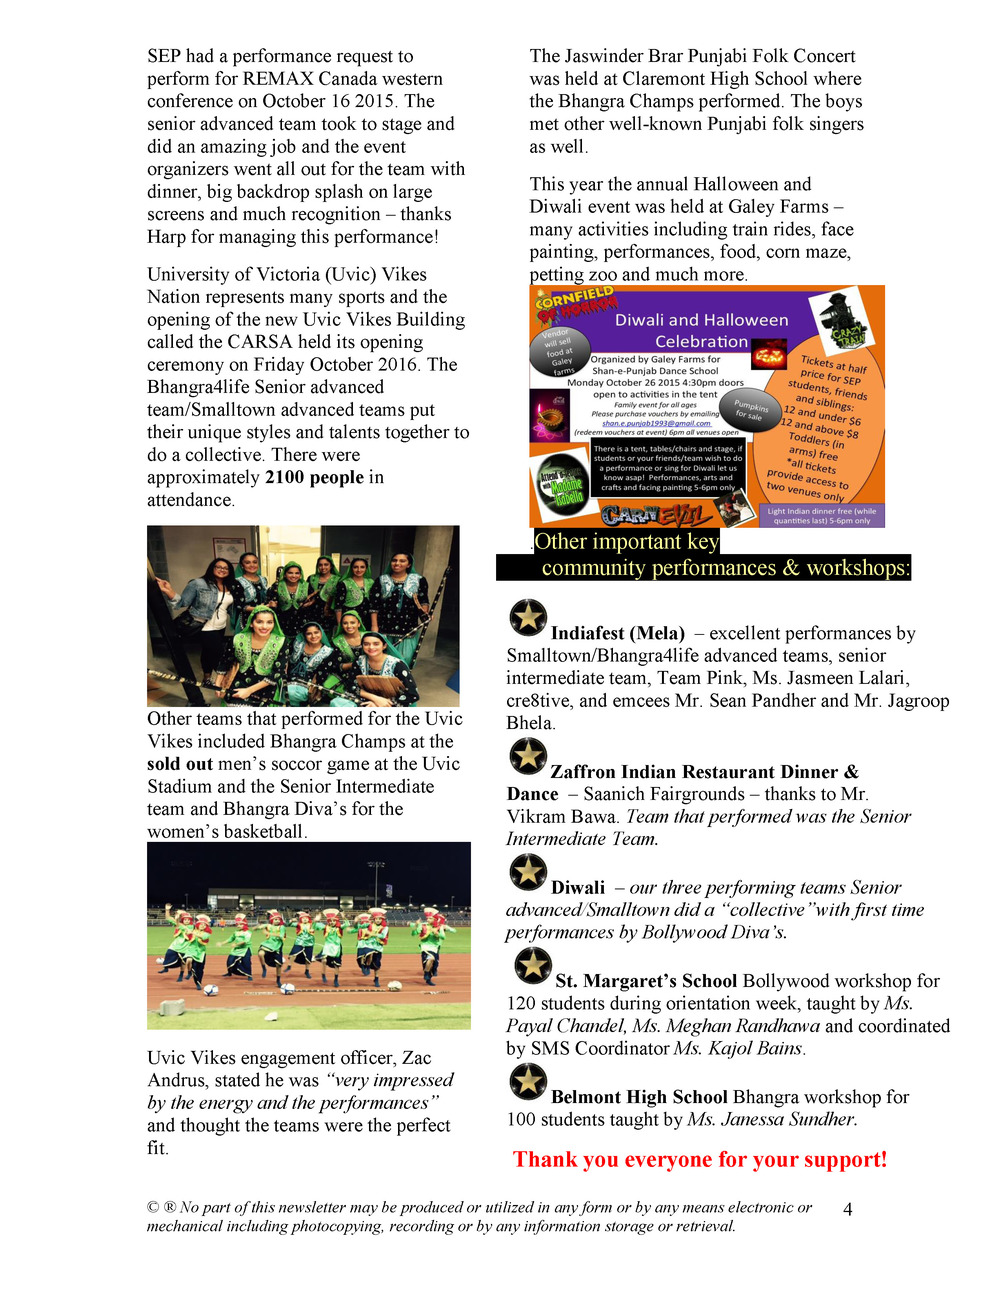 Newsletter_Volume_11_2015_FINAL_Page_4[1].jpg